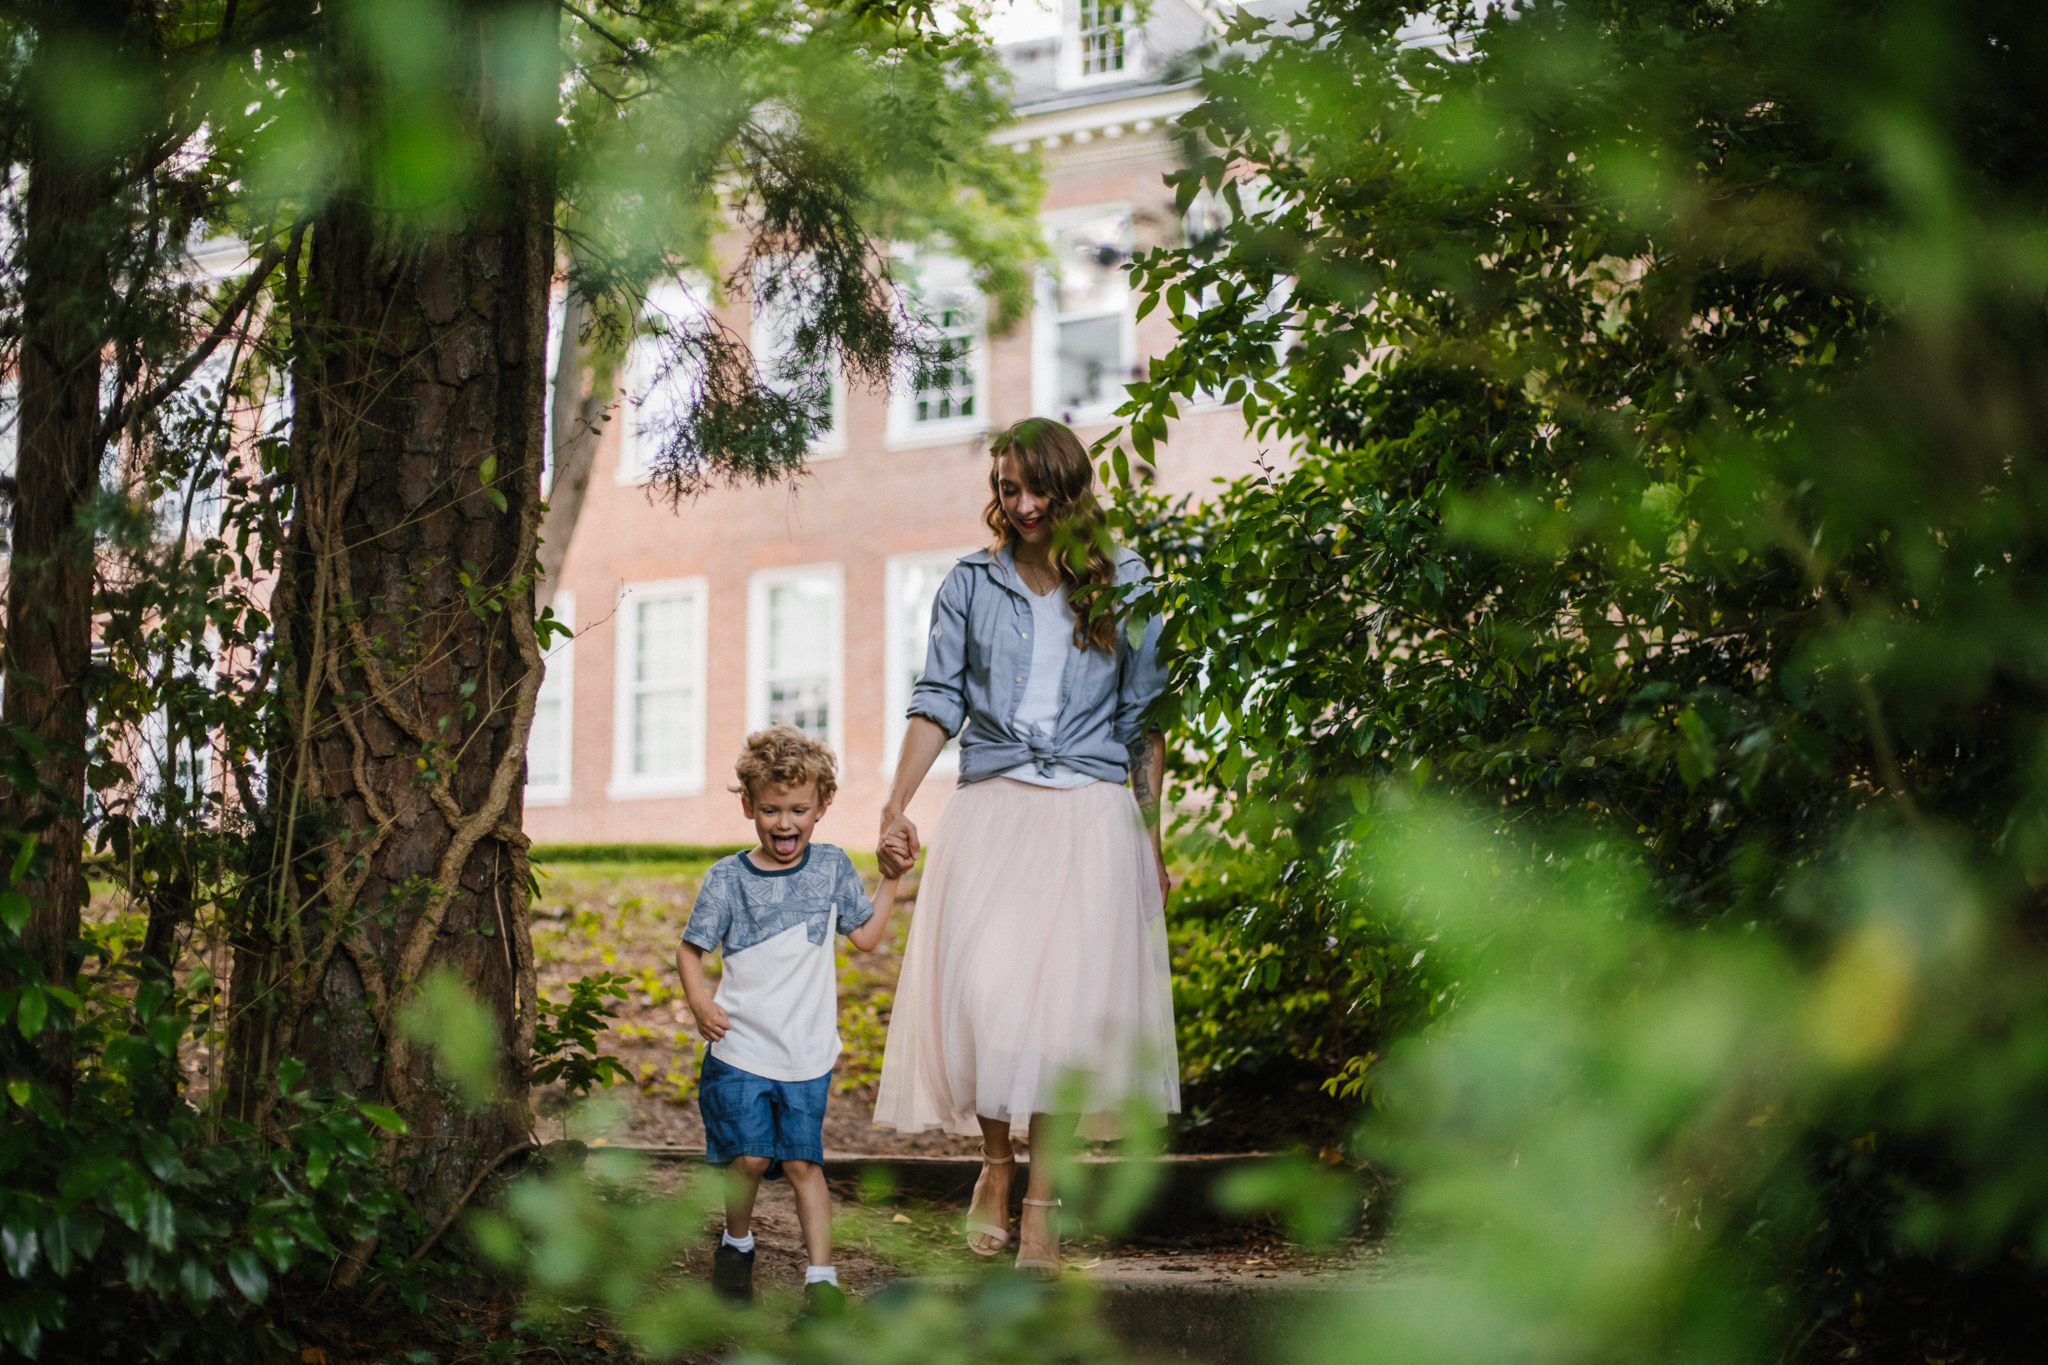 Nicoleandjack_colonialwilliamsburg_mommyandme_meadowsfrozencustard-44.jpg